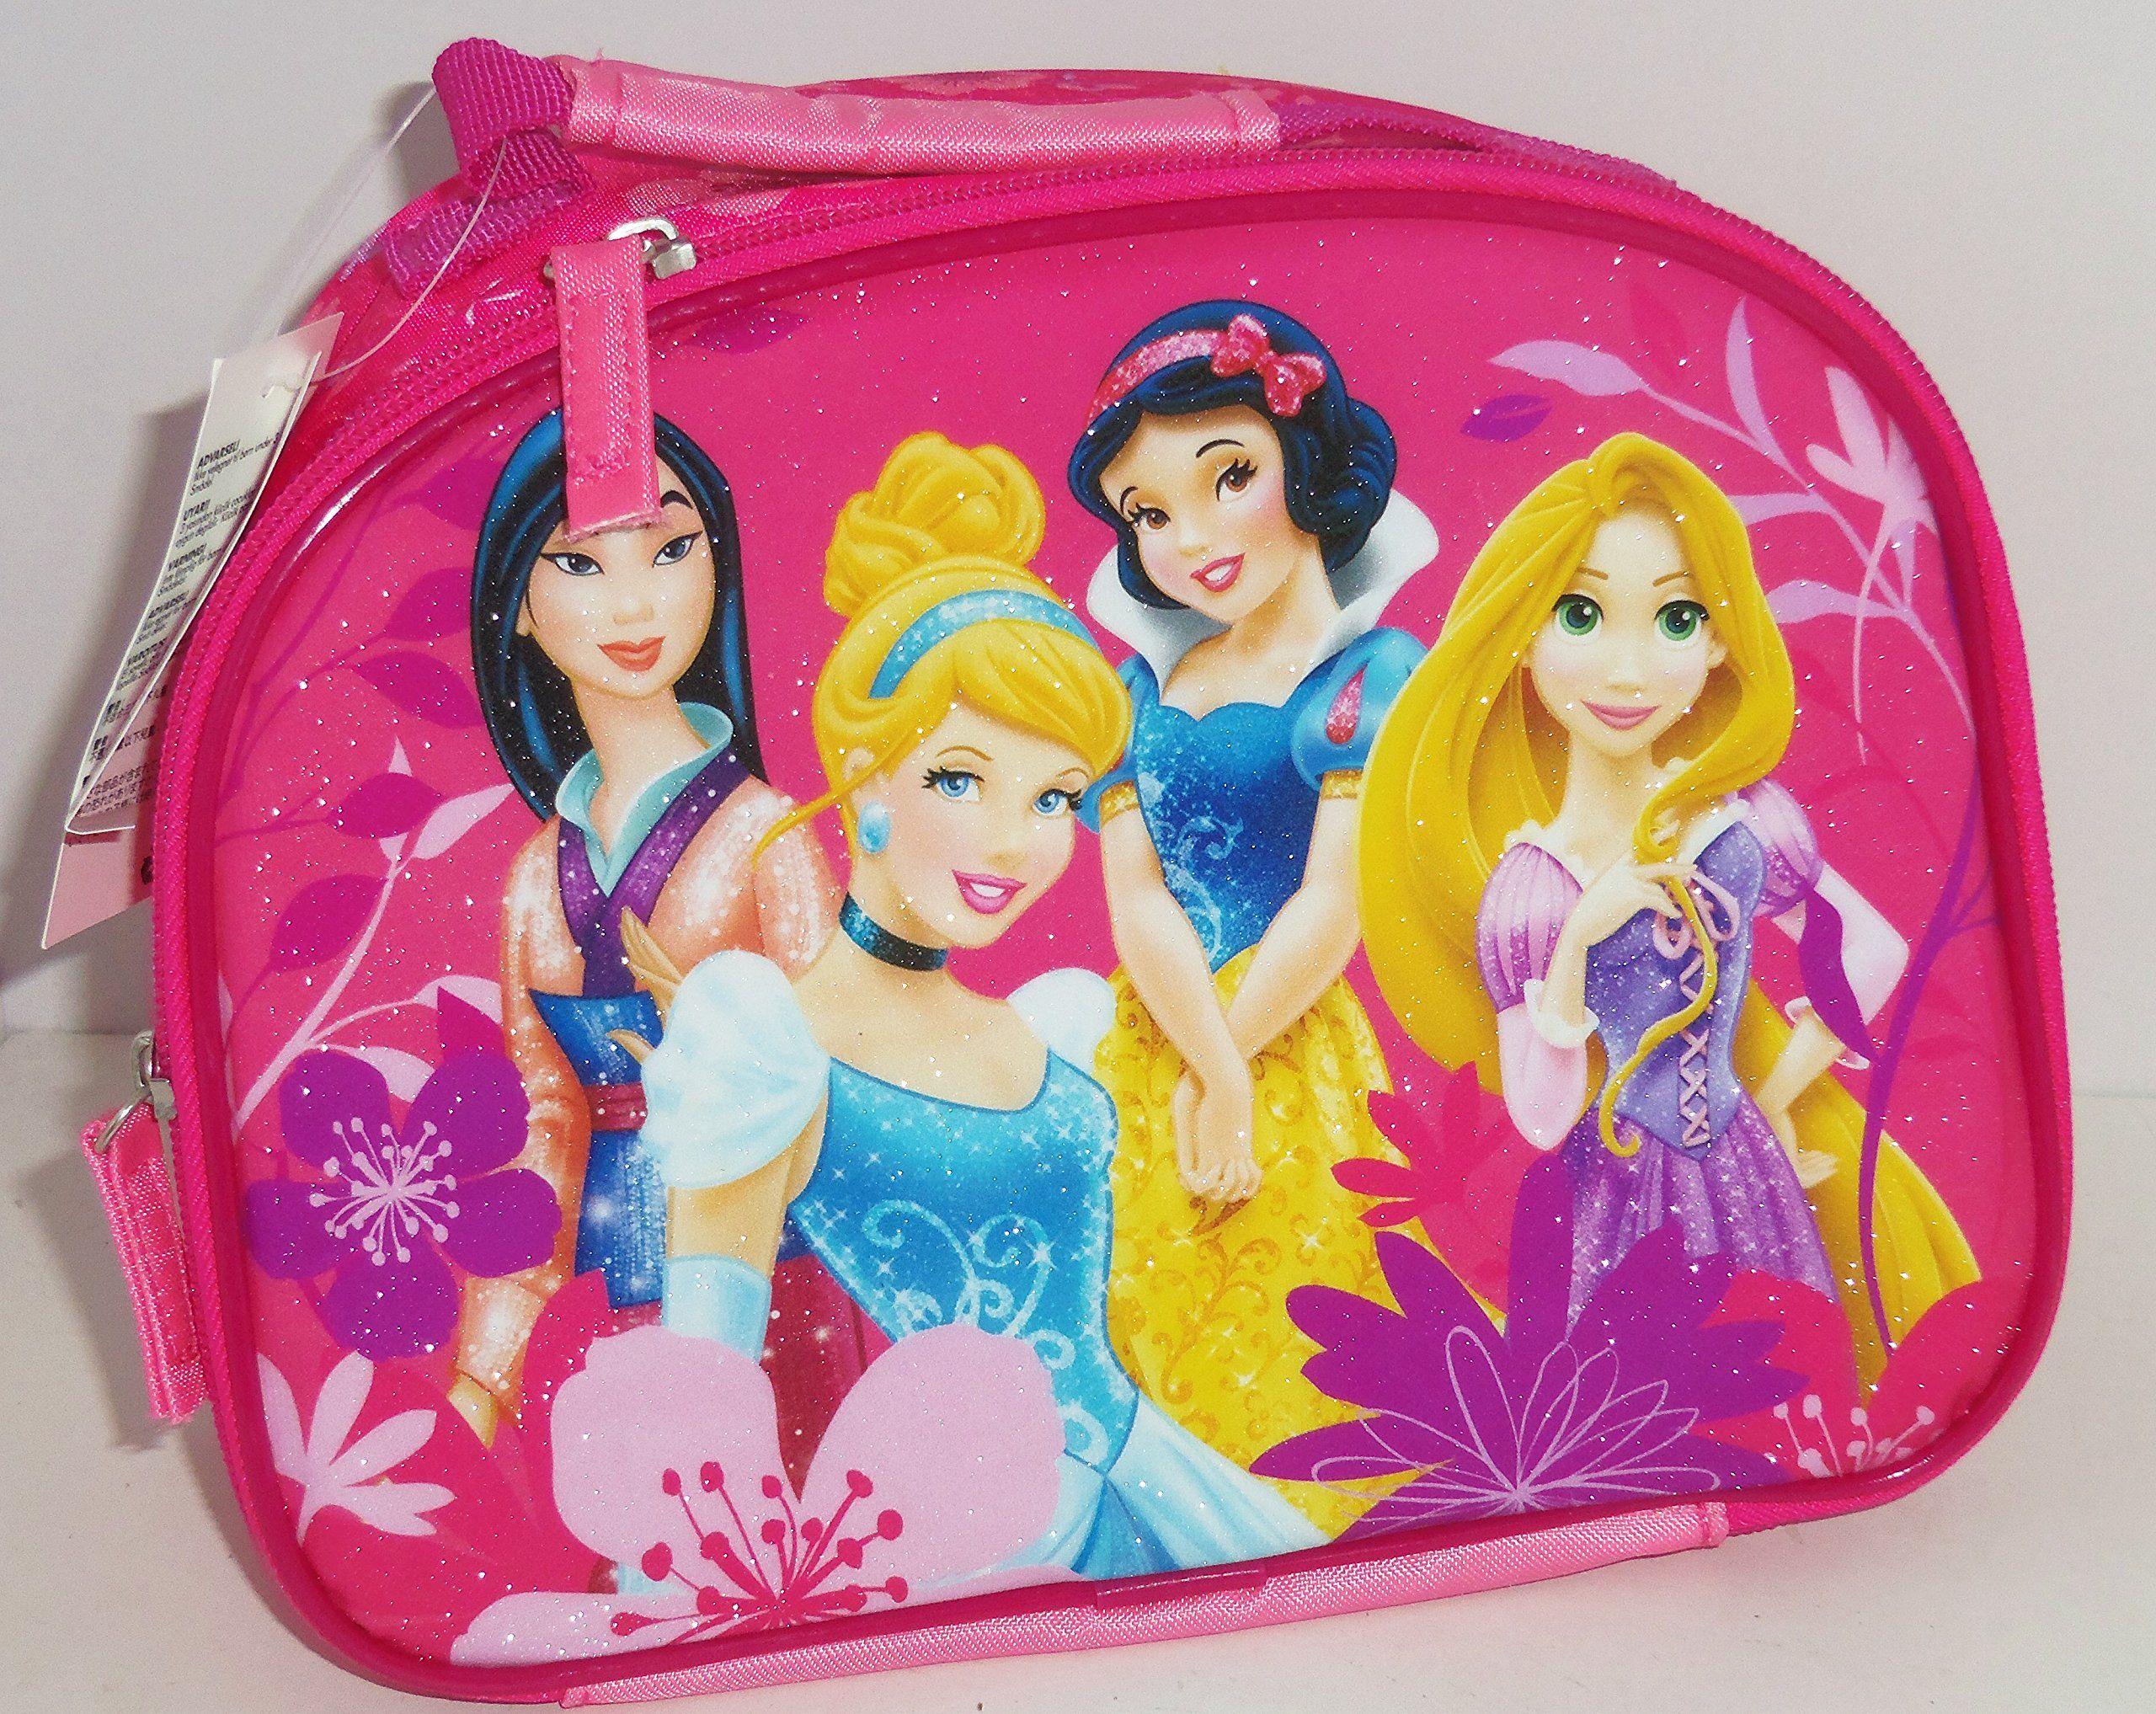 949ad03b906 Disney Princess Cinderella Rapunzel Mulan Snow White Lunch Tote Box Bag  Pink Glitter